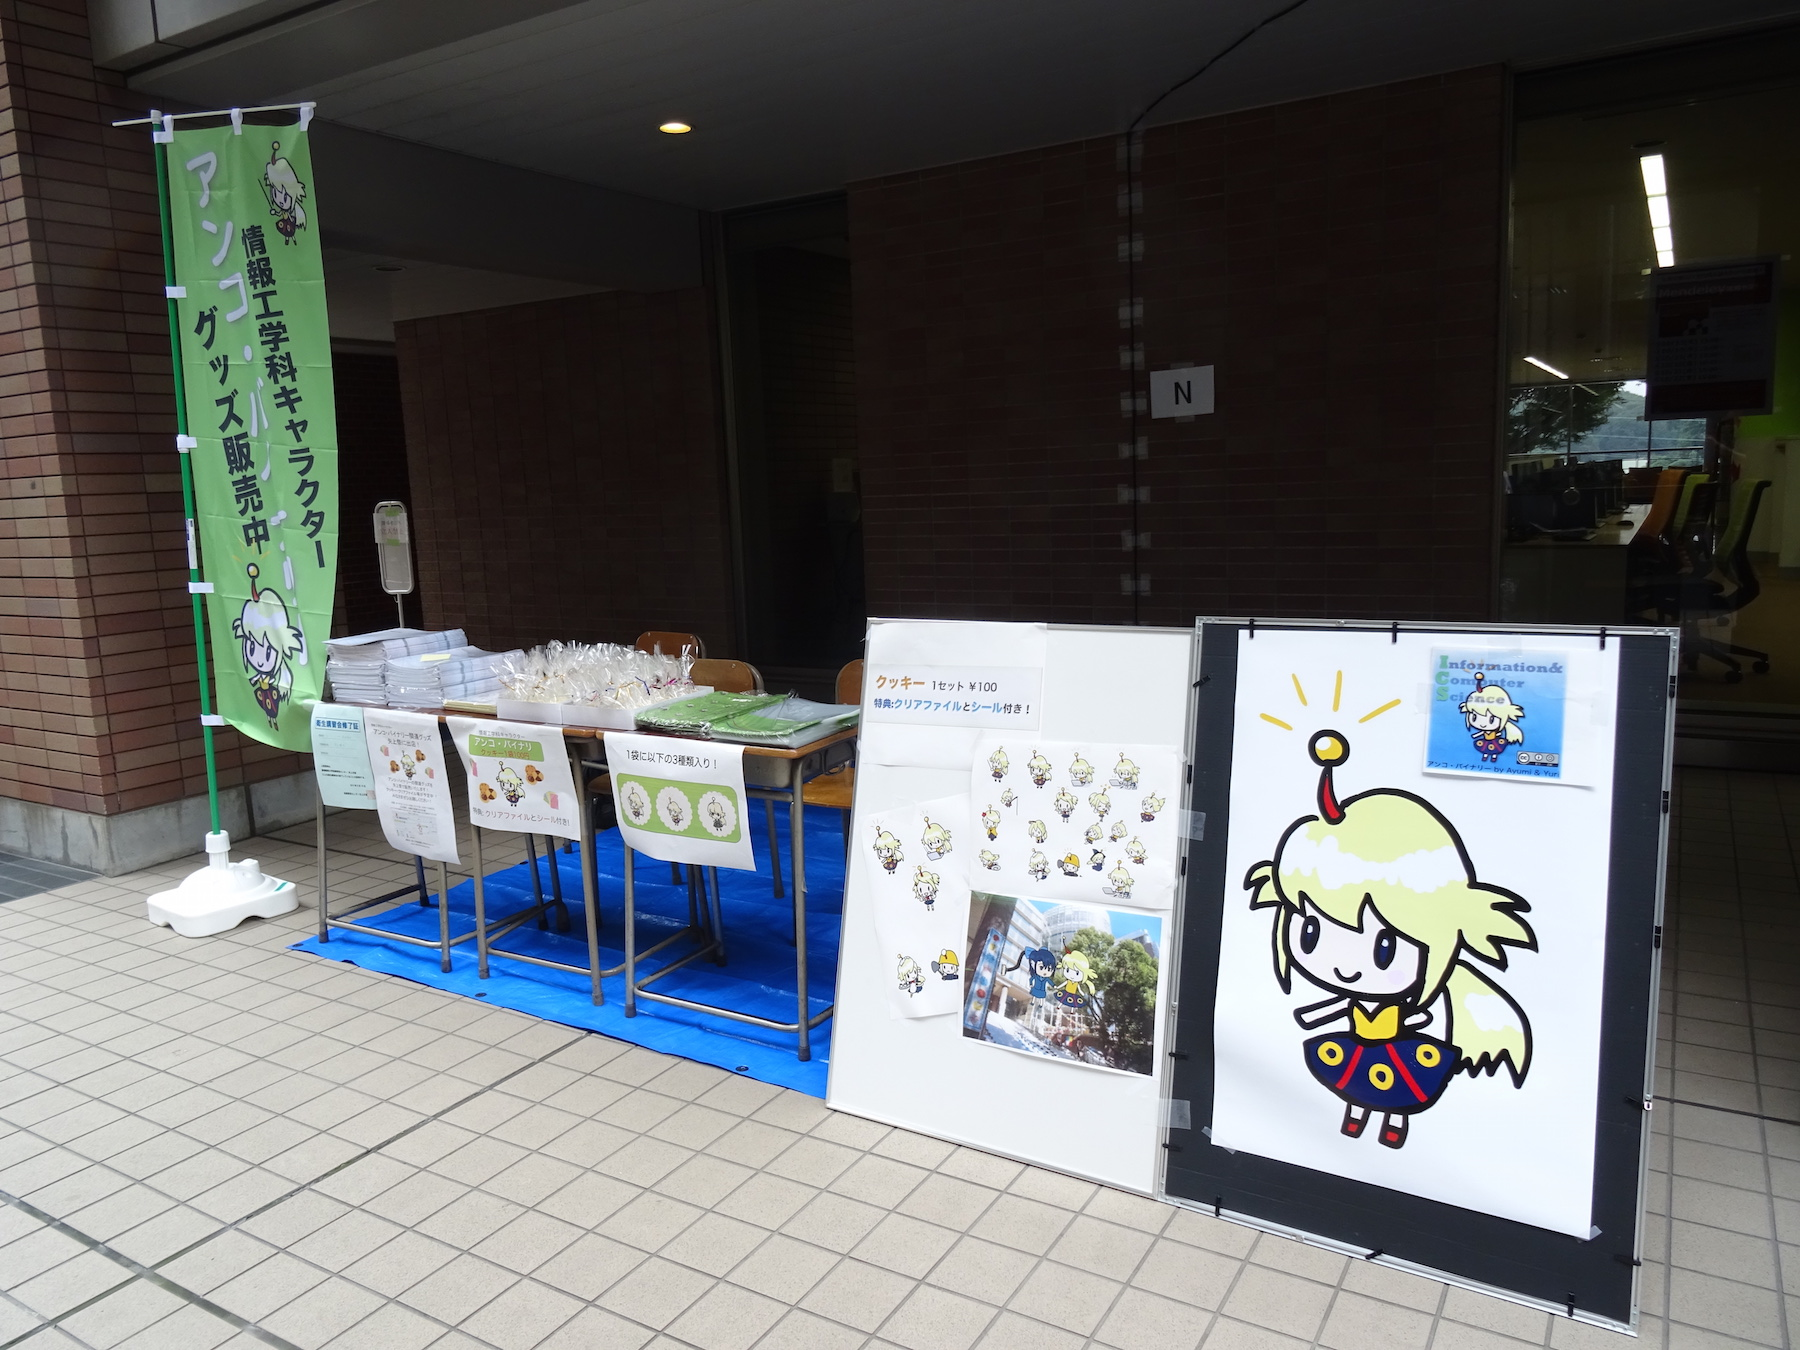 yagami_fes_ics_booth